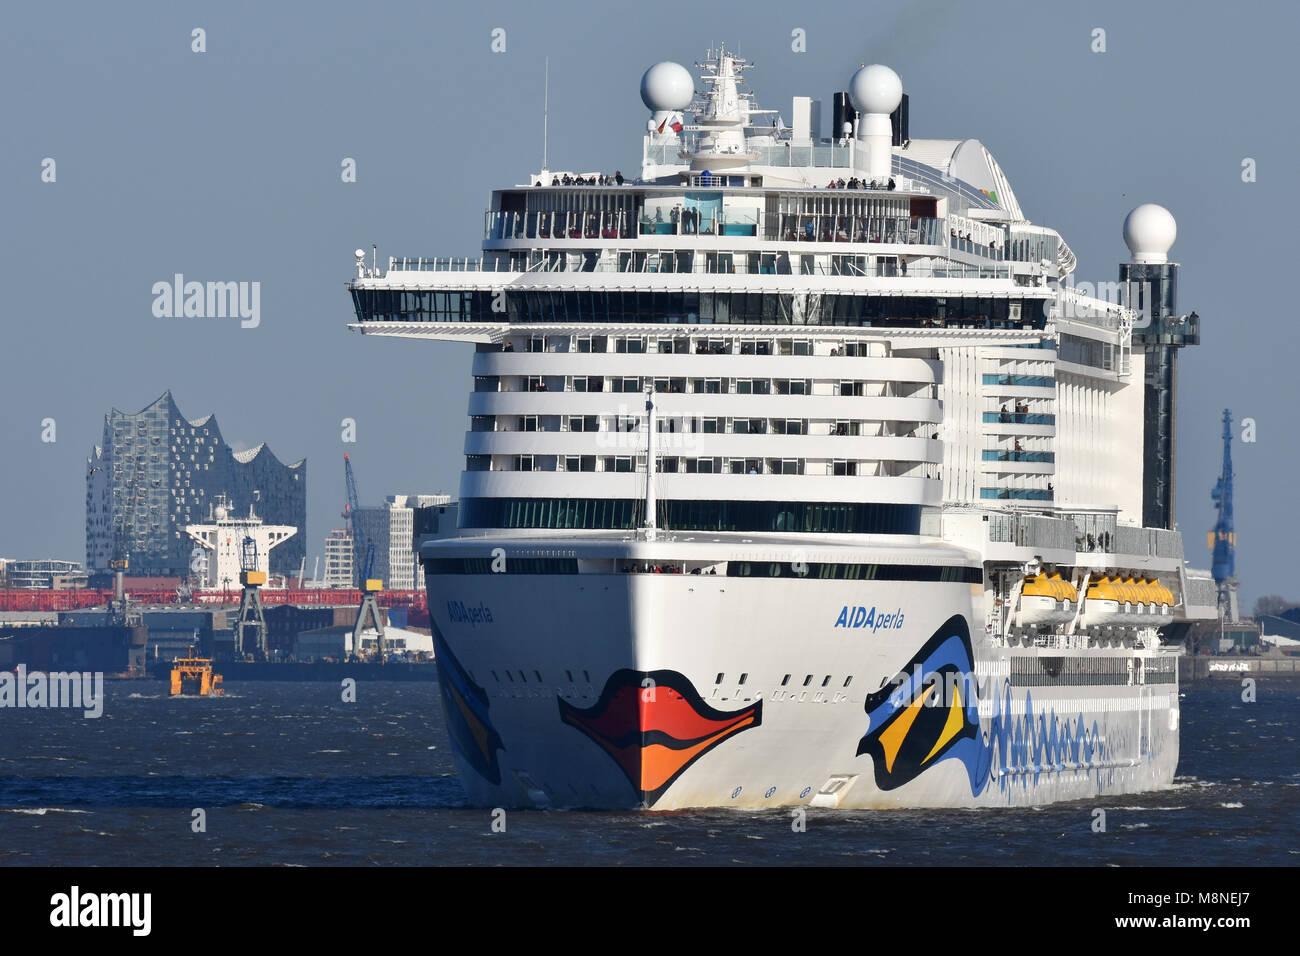 AIDAperla leaving Hamburg - Stock Image